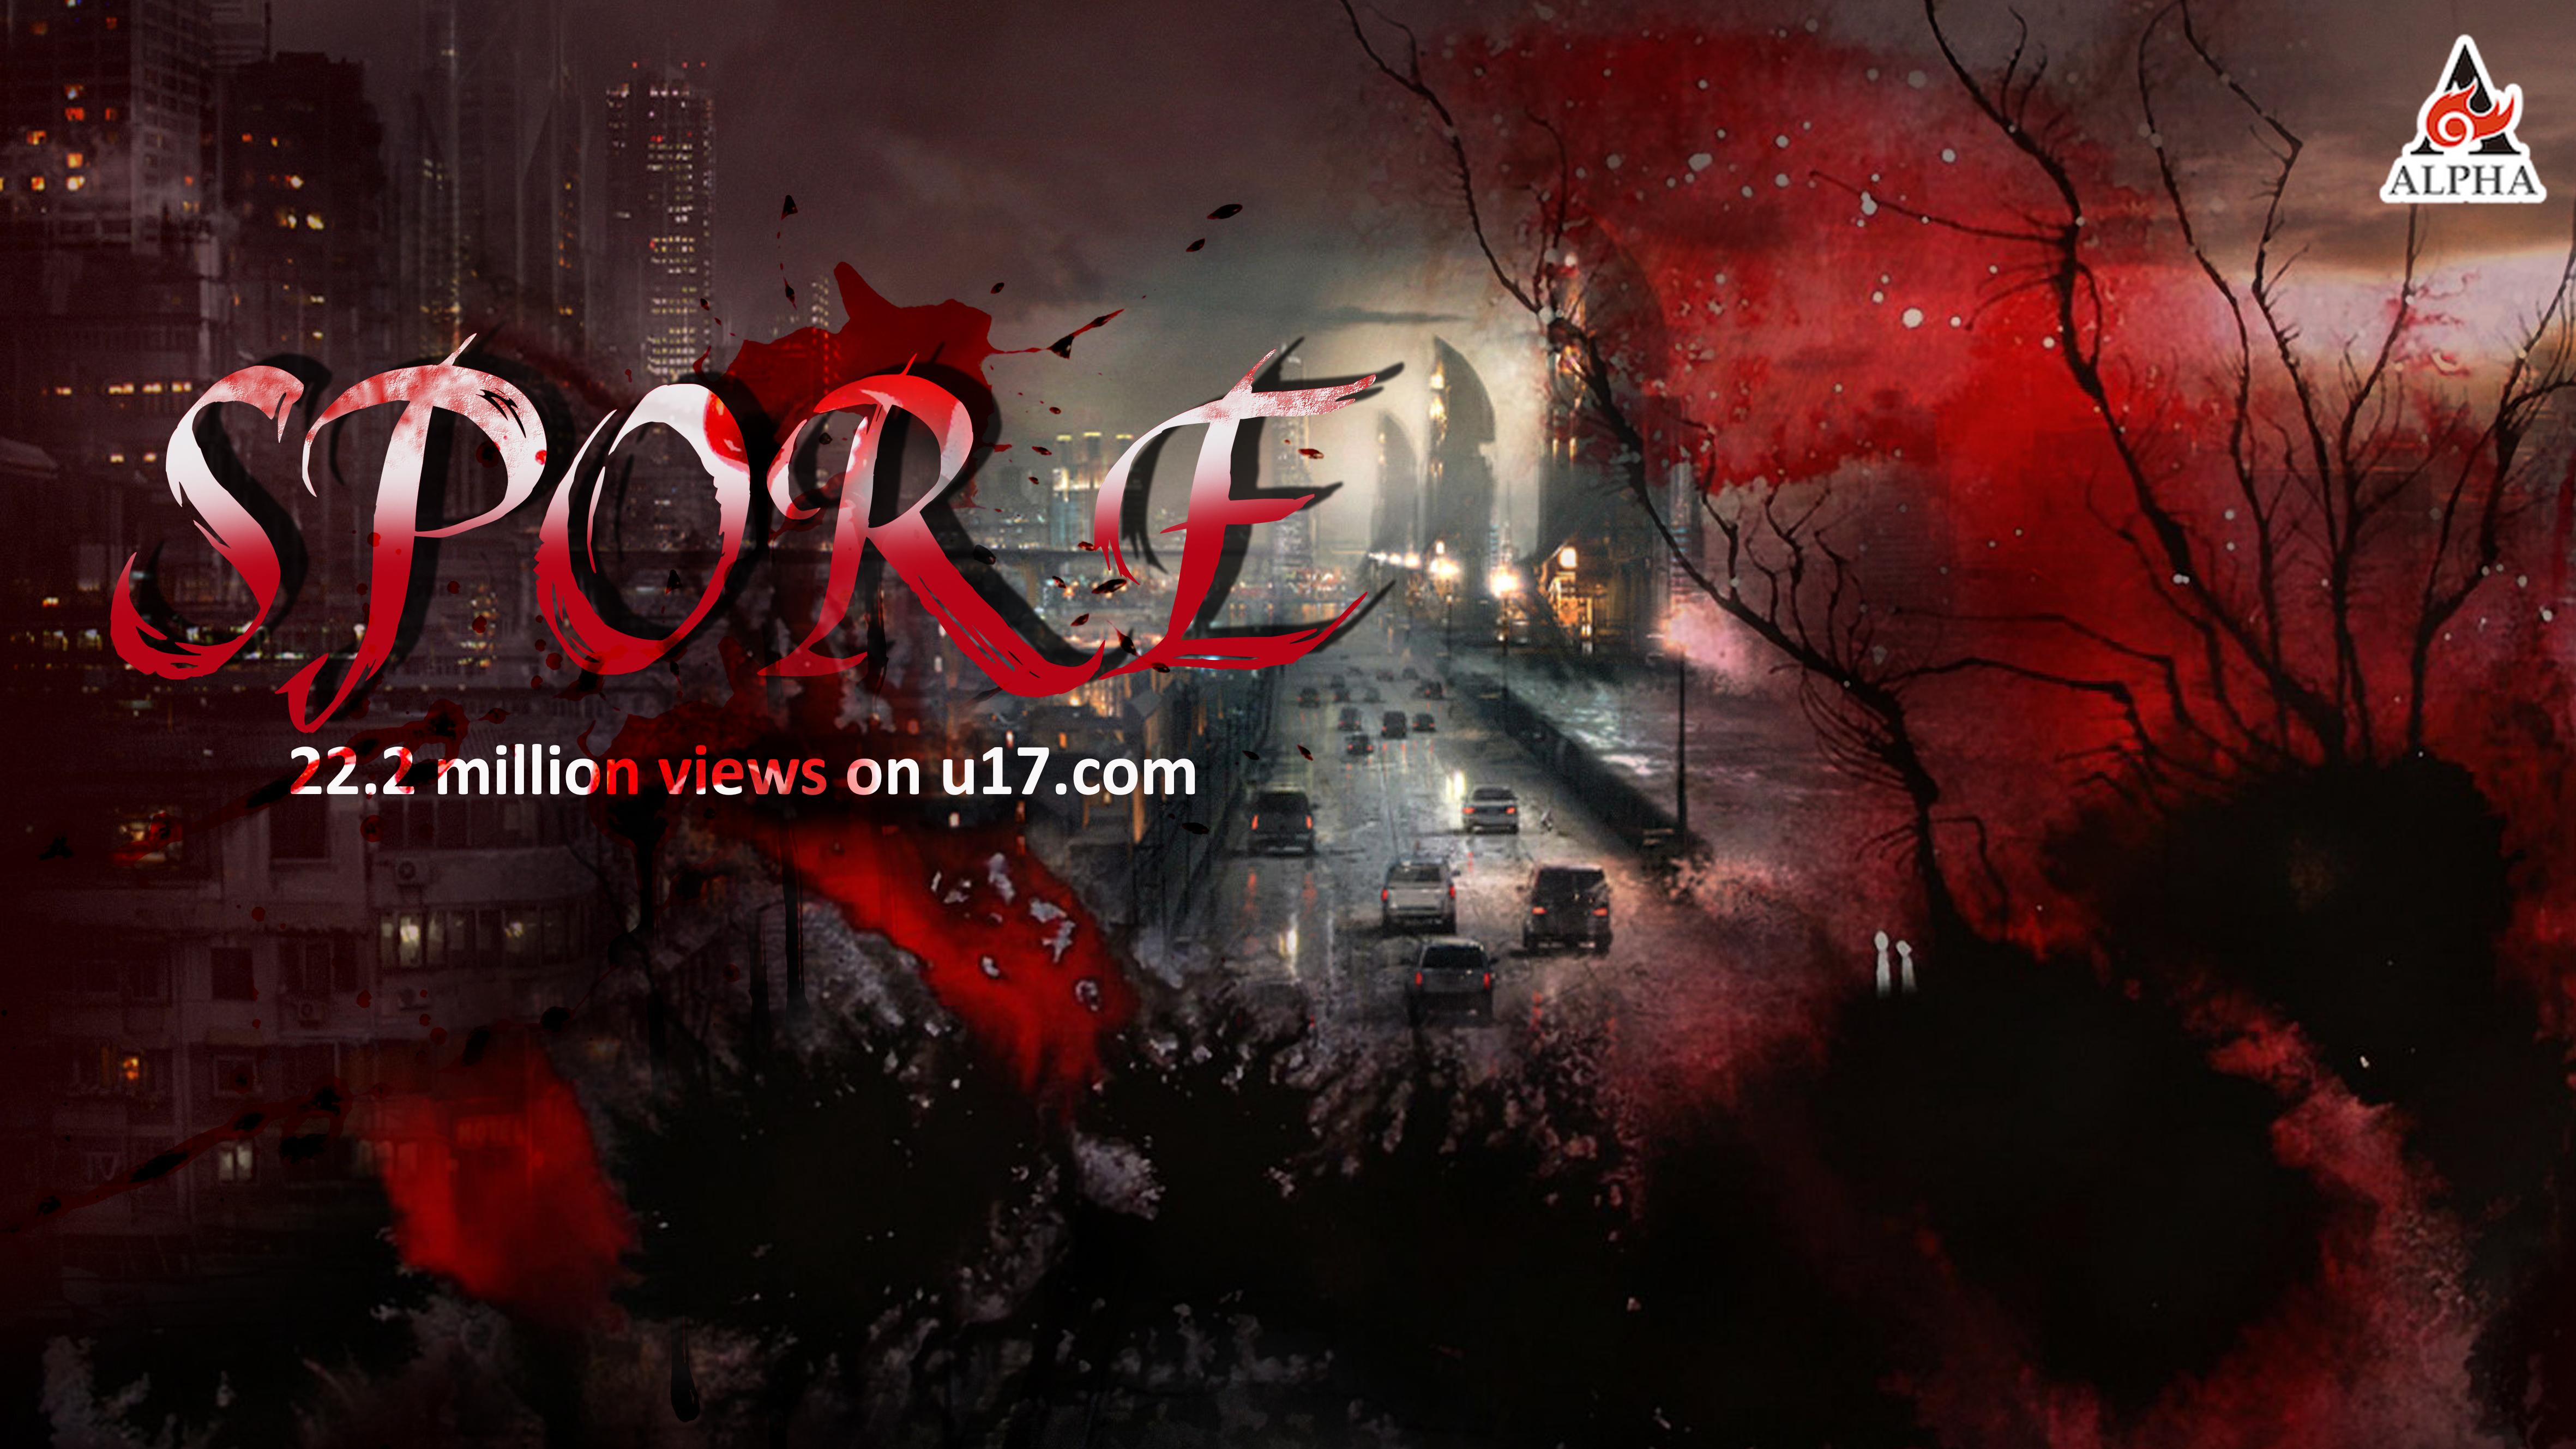 Horro film-Spore